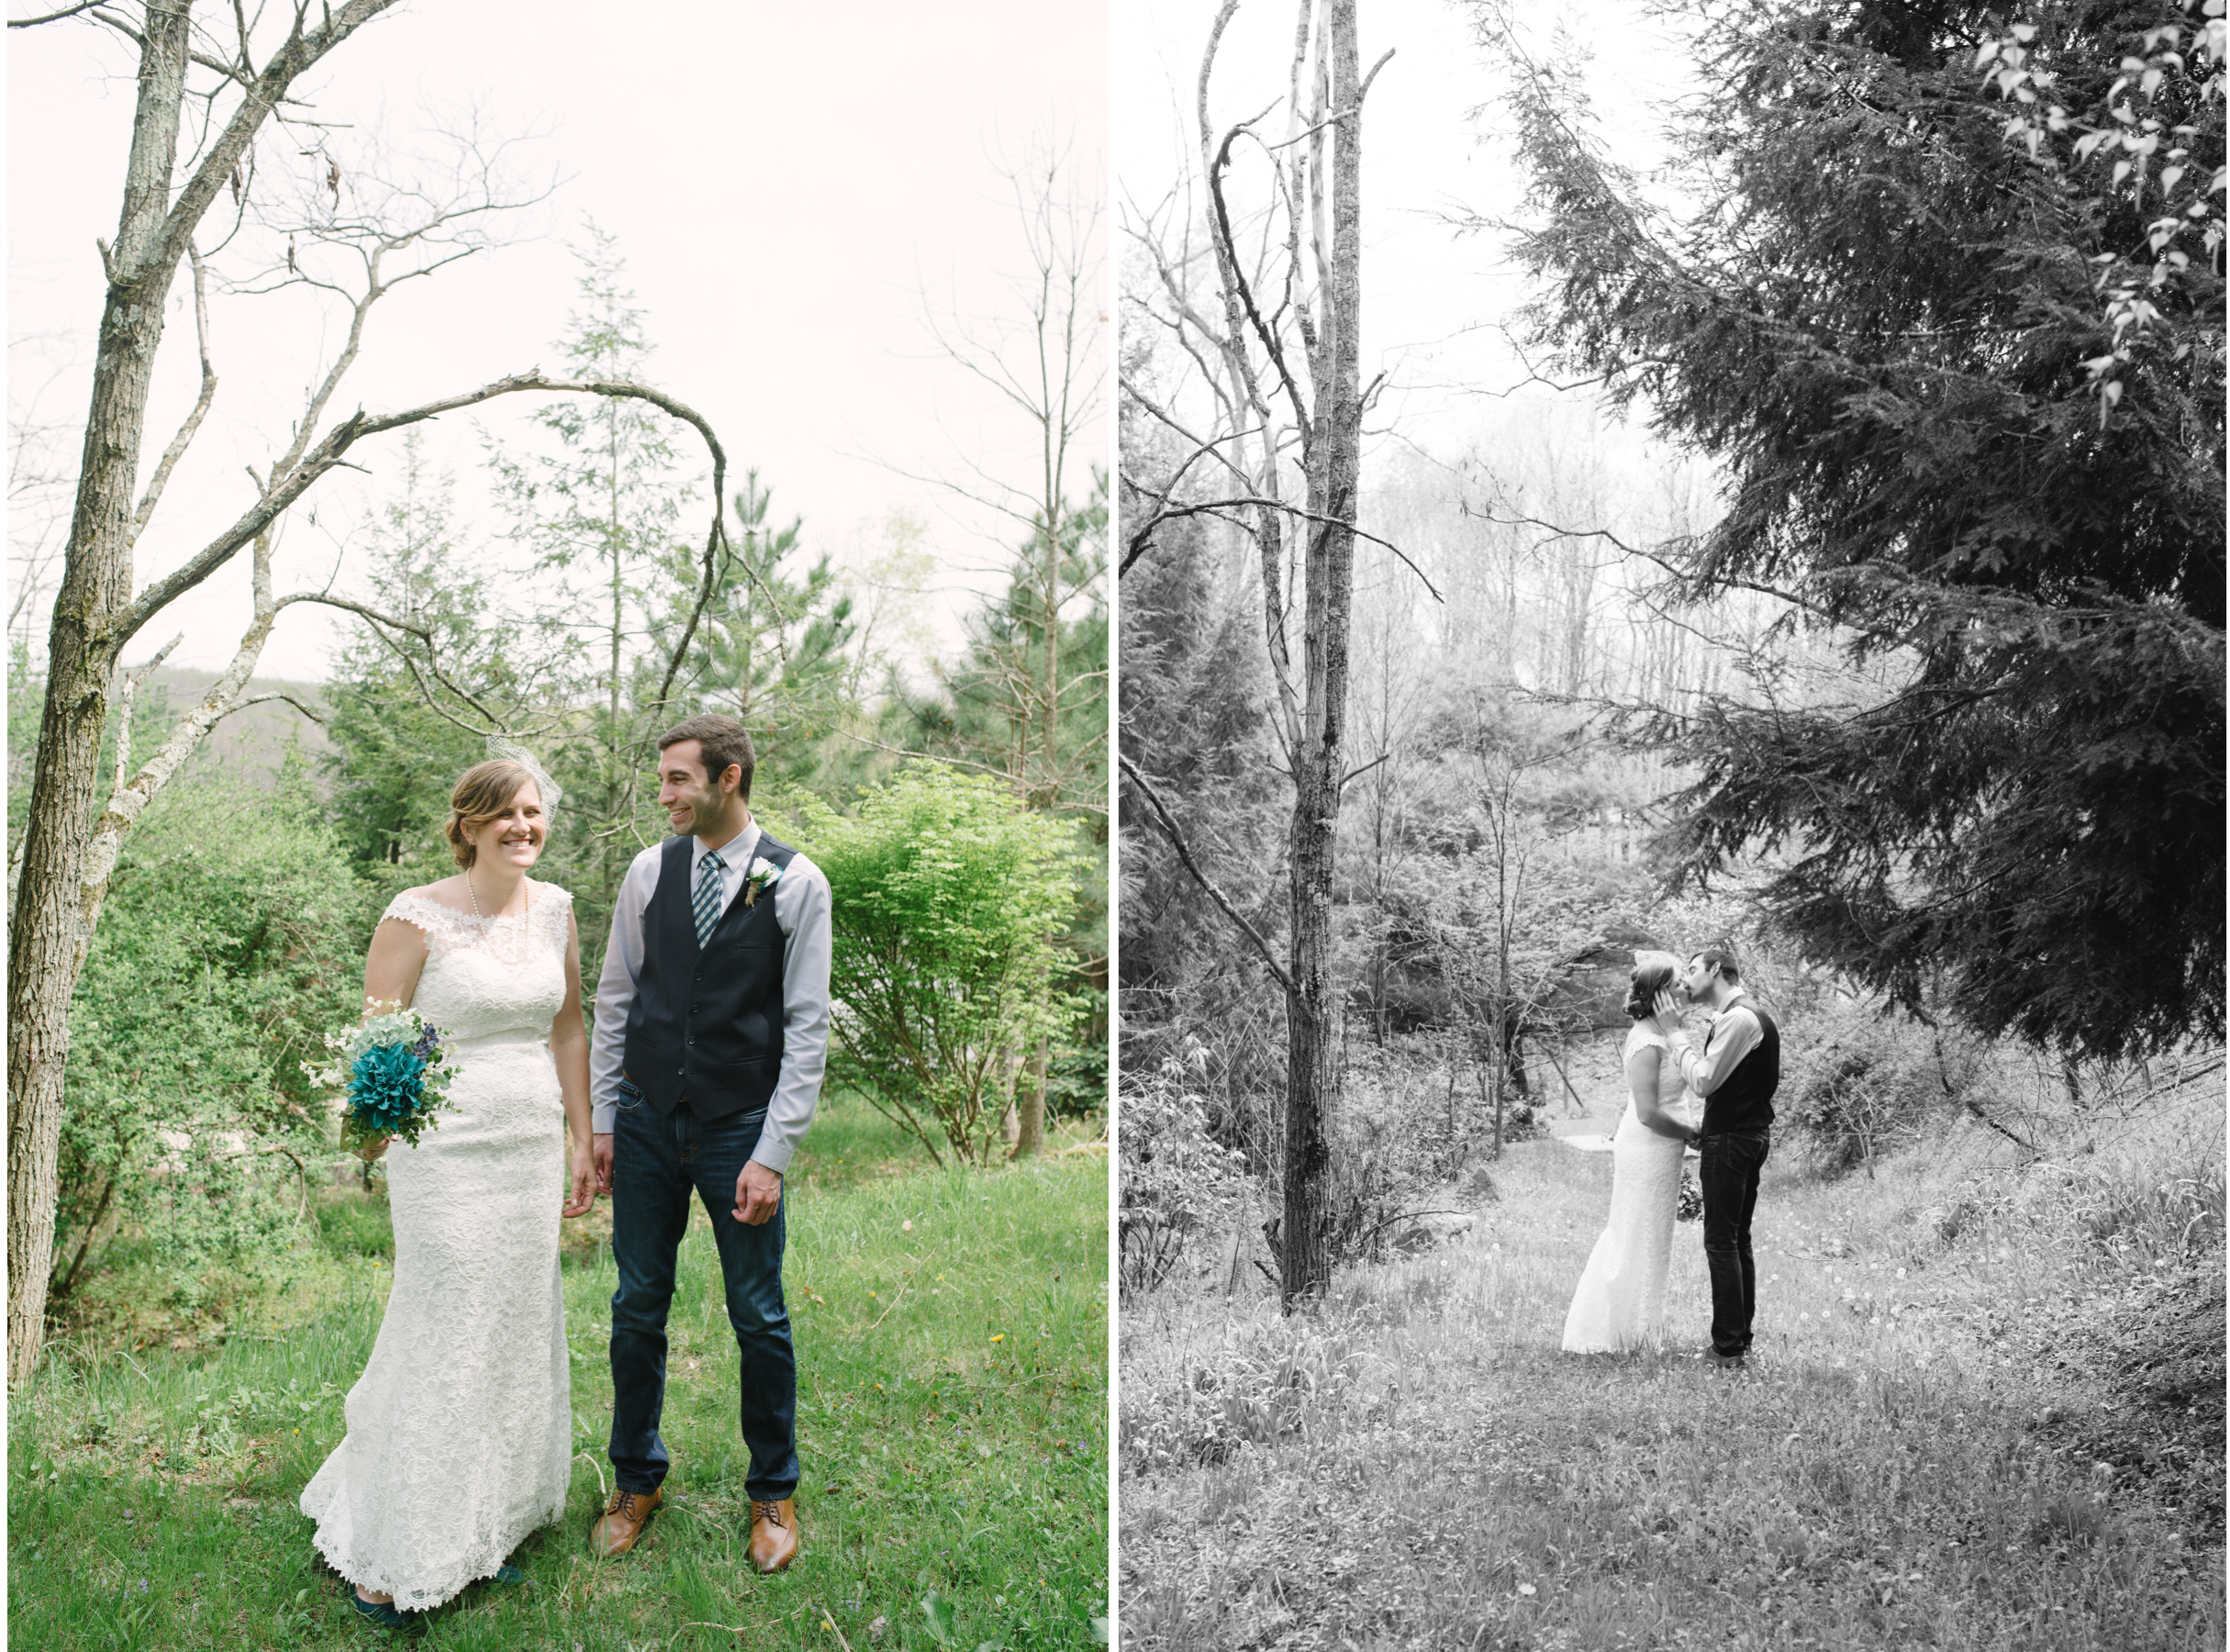 Wedding Photography Oak Lodge, Ligonier PA photographer Mariah Fisher.jpg